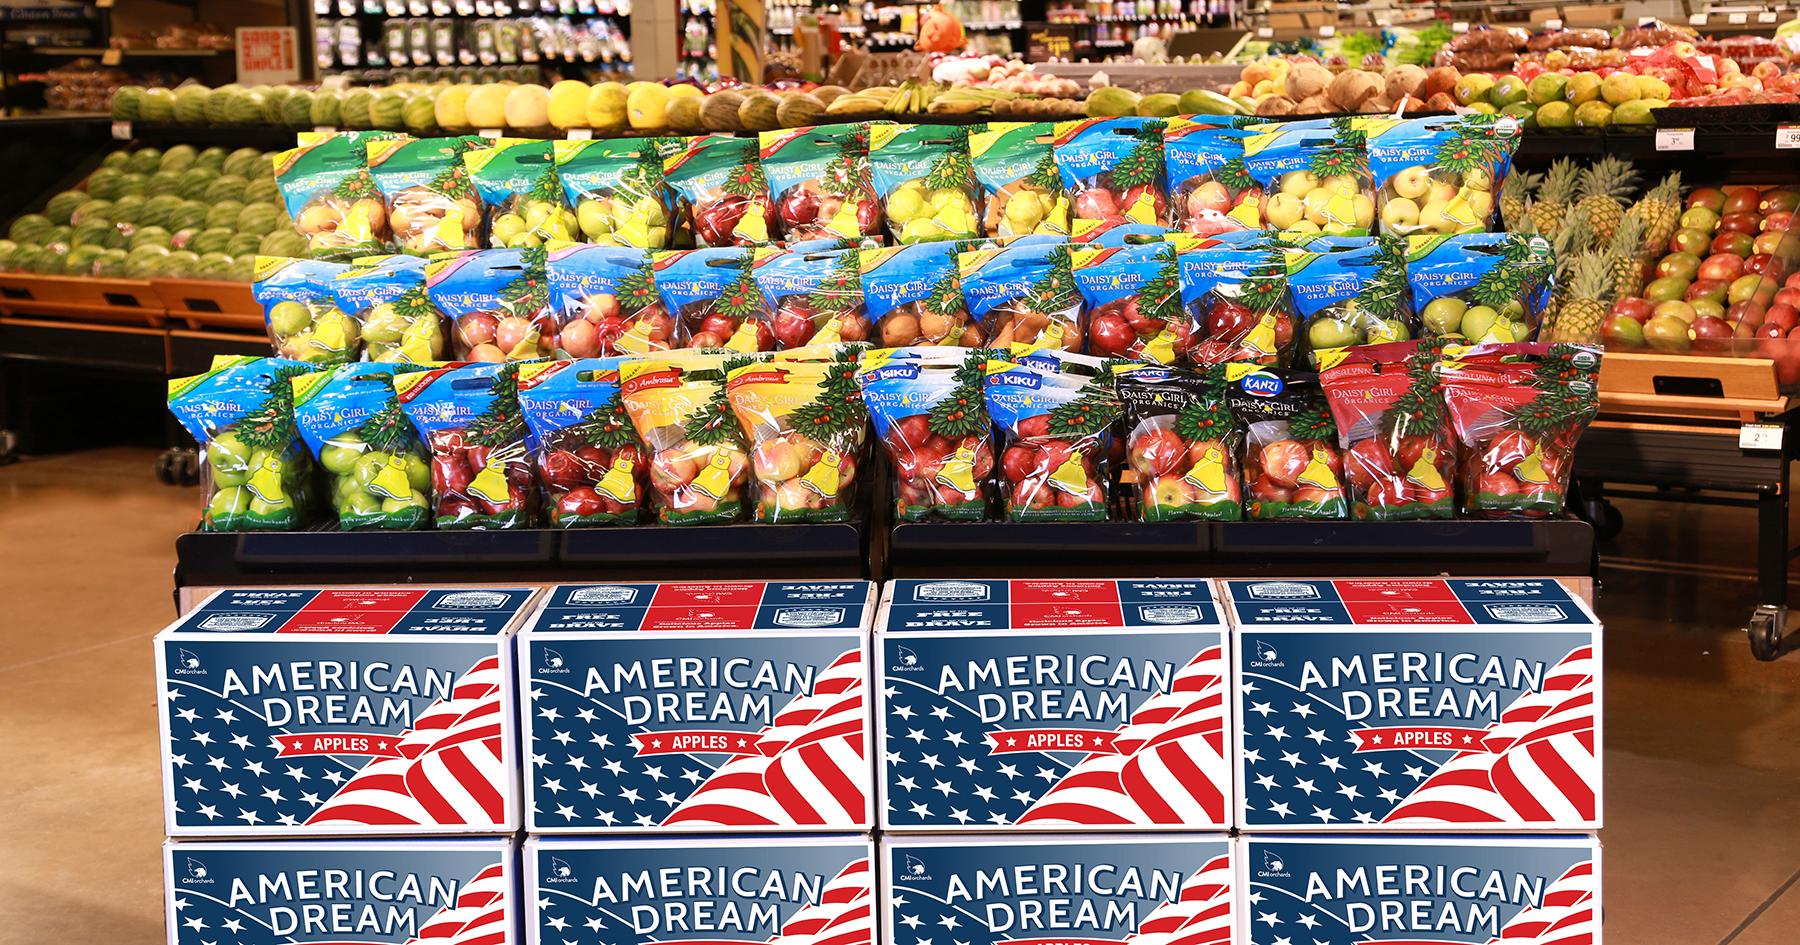 american dream apples